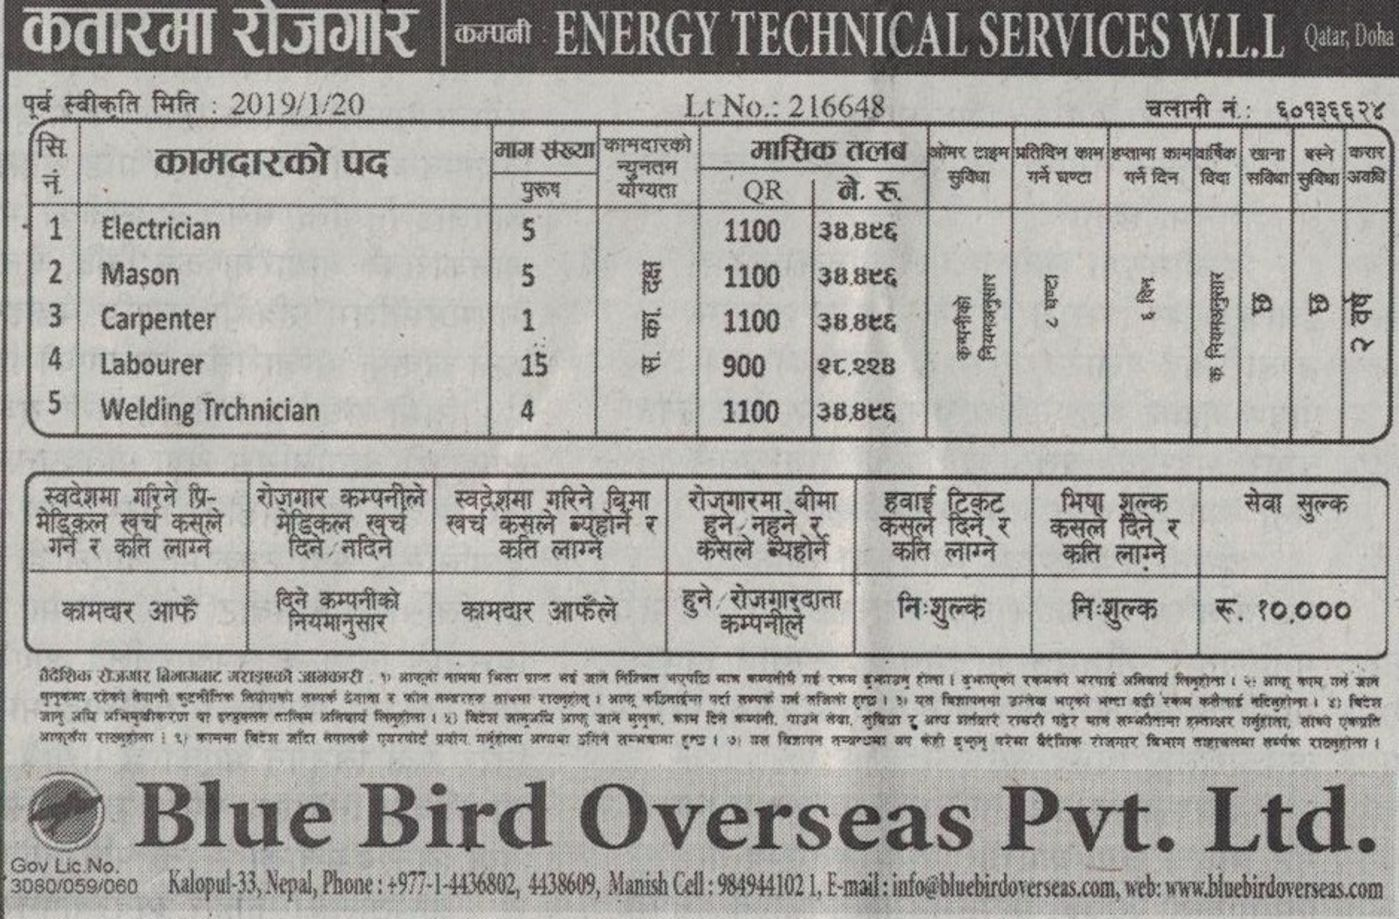 Jobs Nepal - Vacancy - Electrician, Mason, Carpenter, Laborer